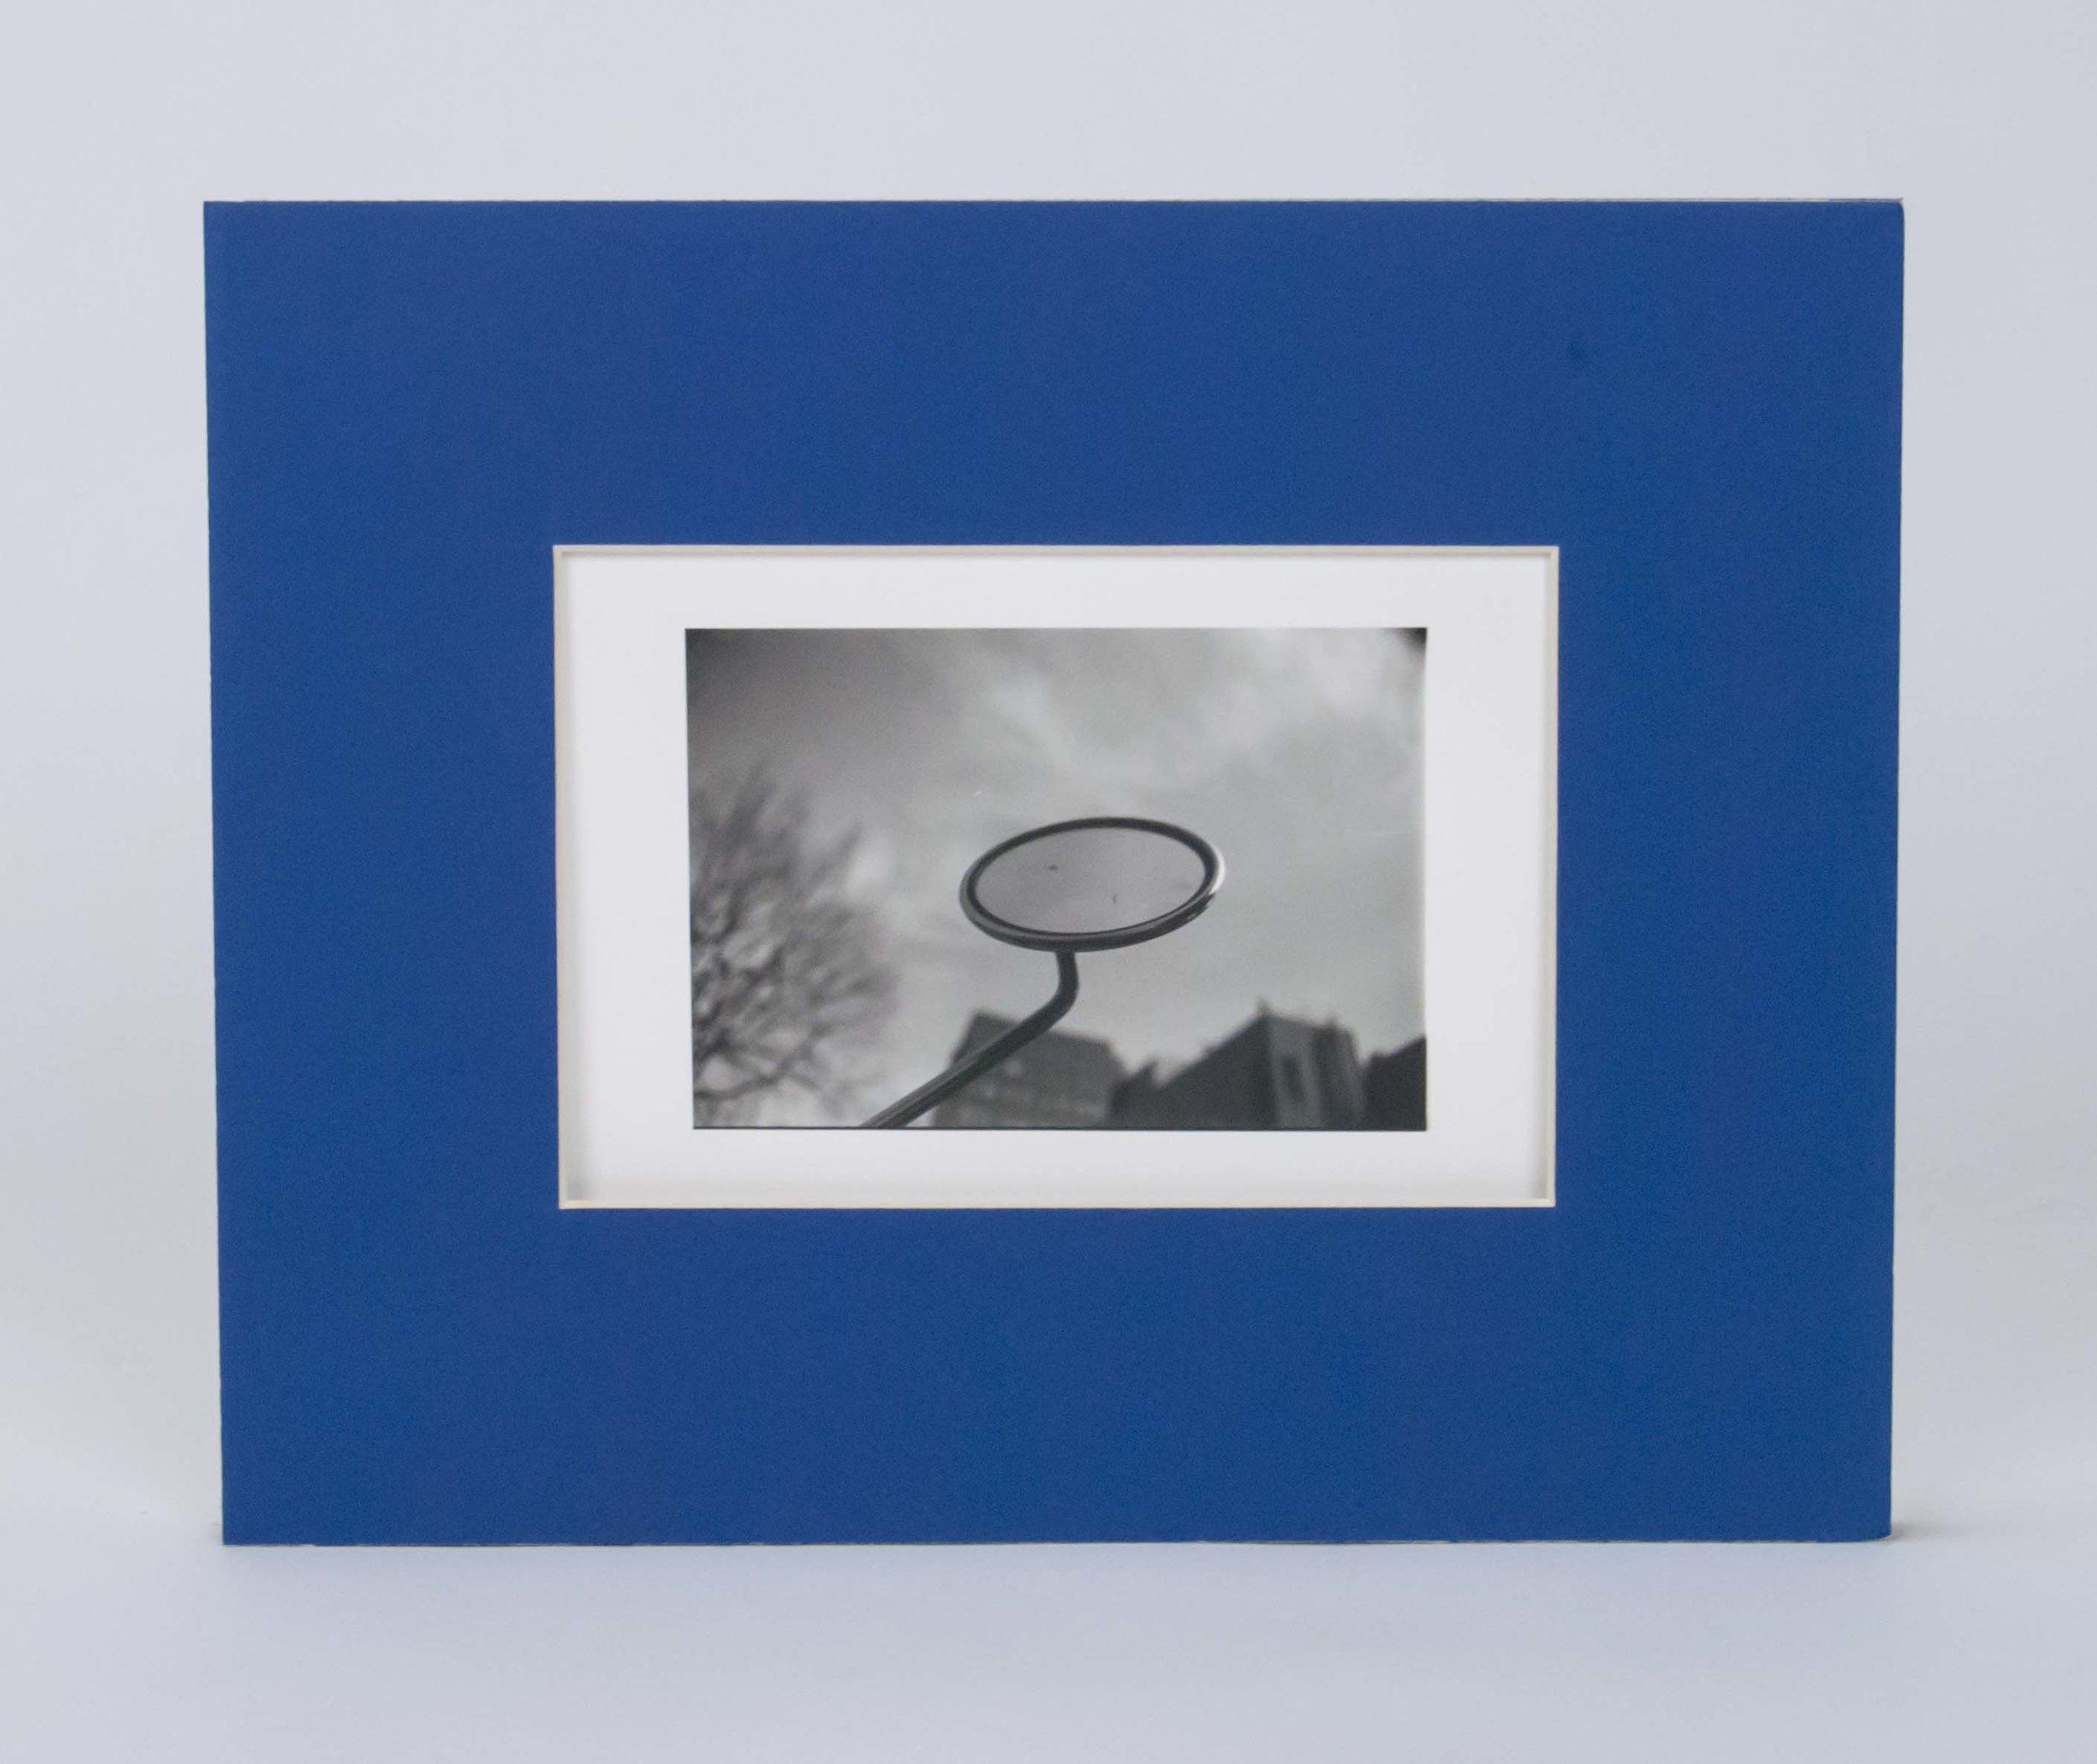 Serendipity. - Philadelphia, PA. 2016.Silver gelatin print in 10